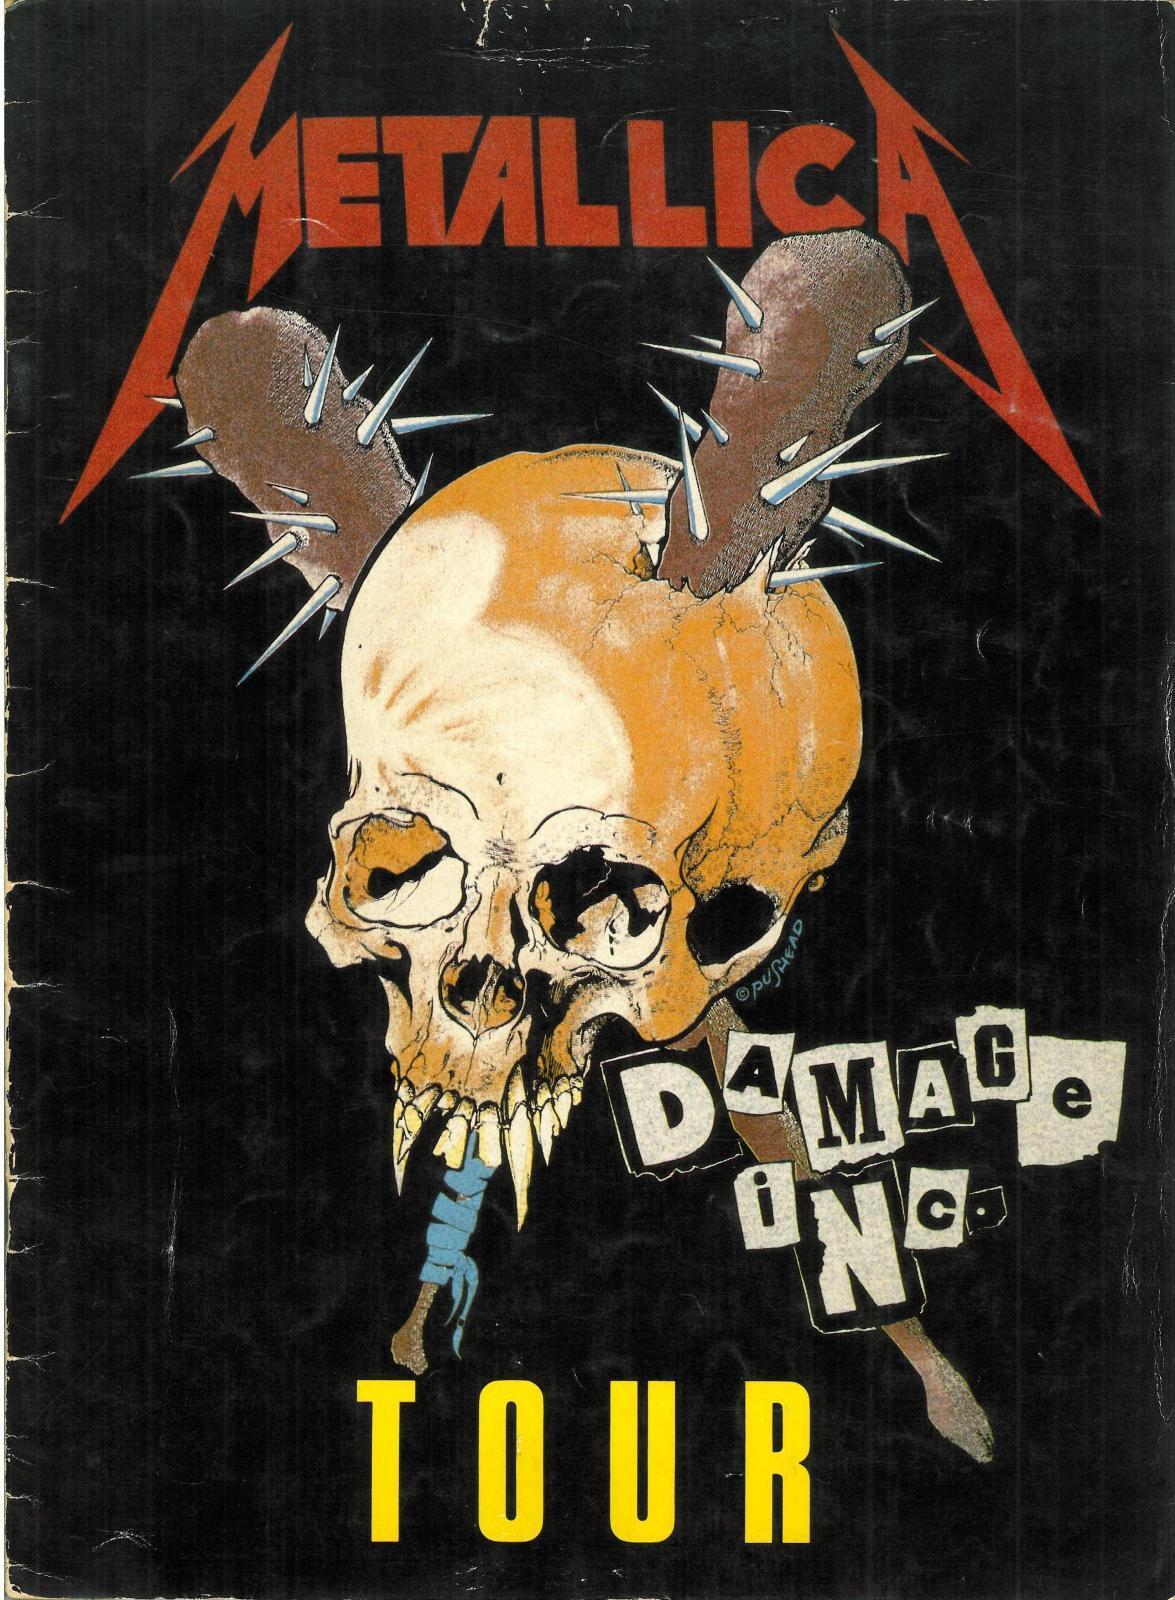 Metallica Damage Inc Tour Jason Newsteds Second Gig